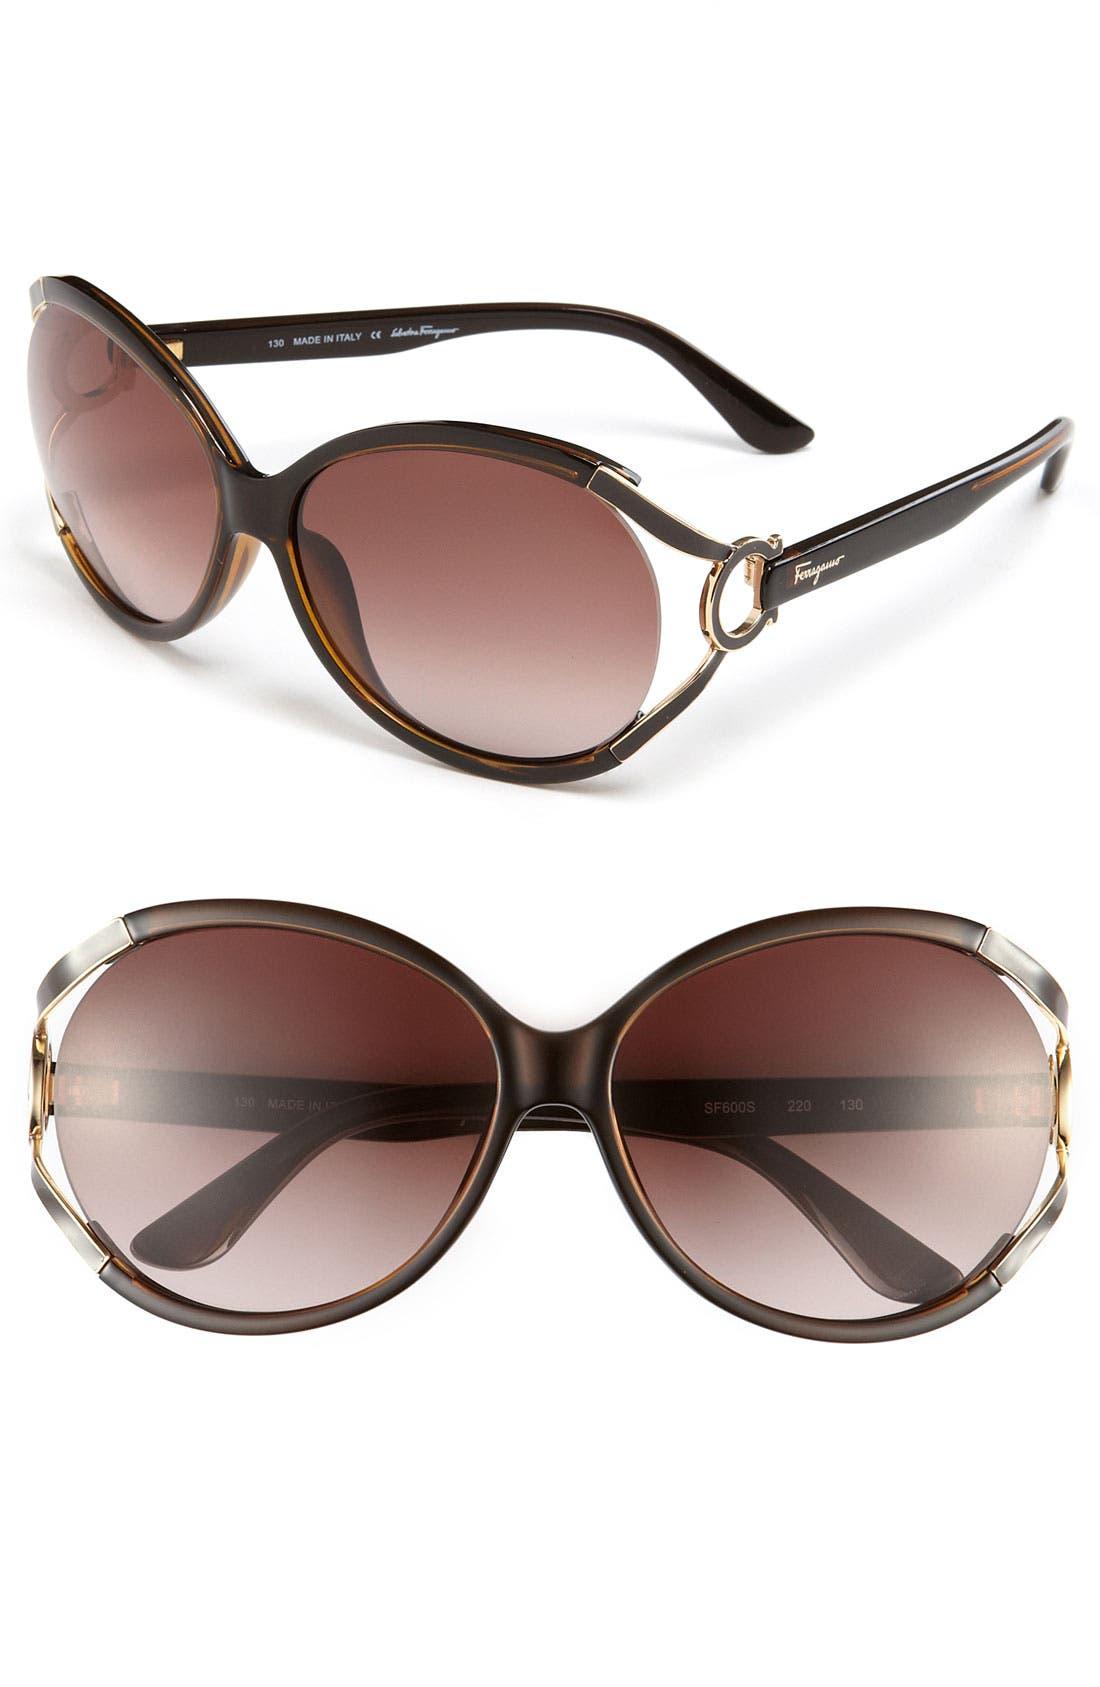 59mm Oversized Sunglasses,                             Main thumbnail 1, color,                             DARK BROWN/ BROWN GRADIENT